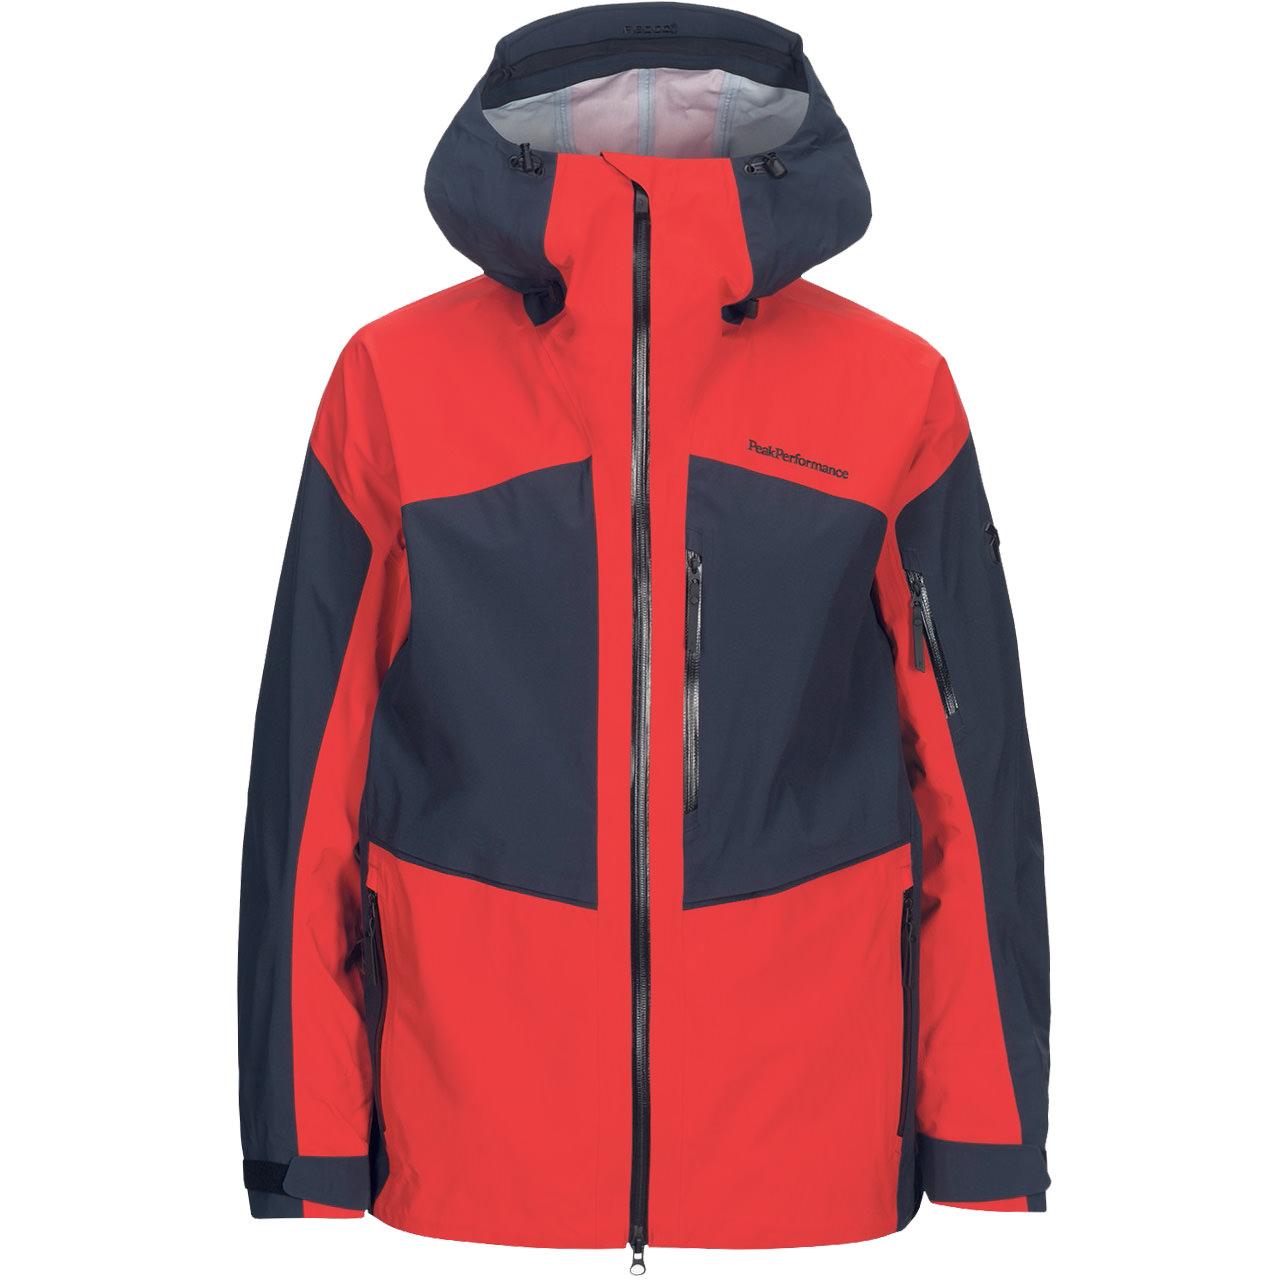 Buy Peak Performance Skiwear for Men online